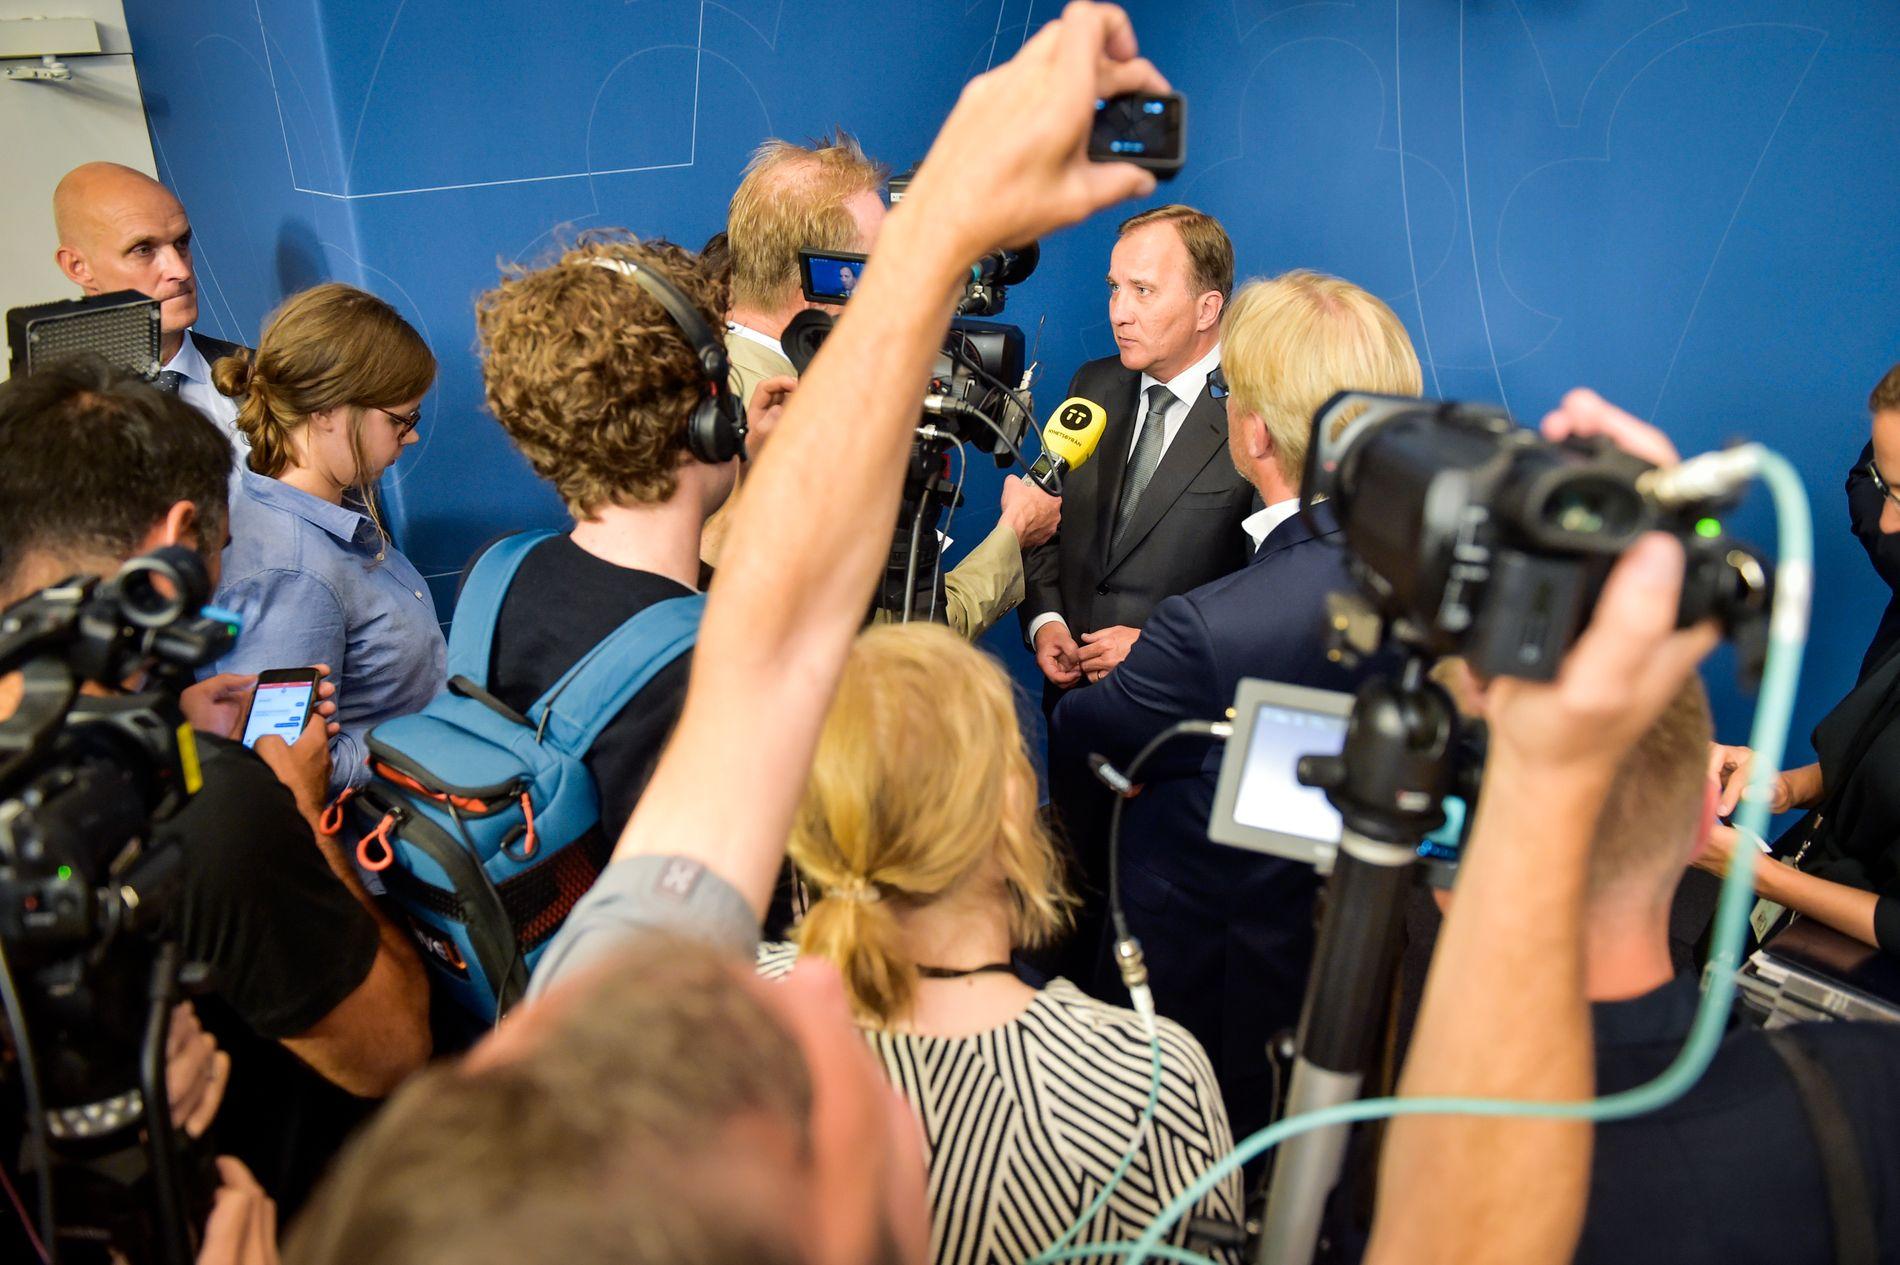 DATATRØBBEL: Statsminister Stefan Löfven holder pressekonferanse i forbindelse med at sensitive opplysninger er på avveie fra det svenske transporttilsynet.